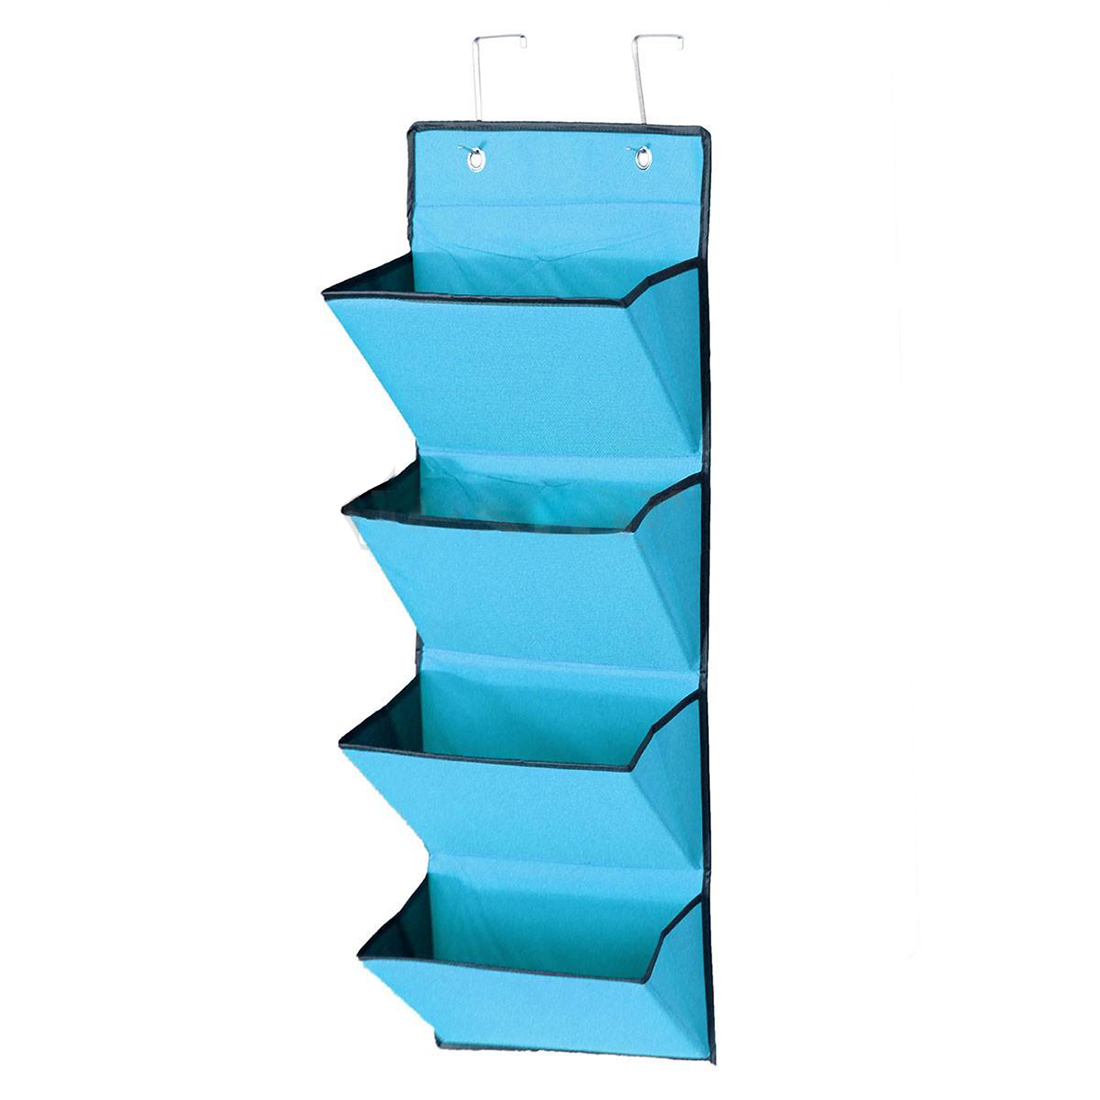 4 nivel puerta de pared colgante organizador almacenamiento Rack Bag bolsa de tela de calzado